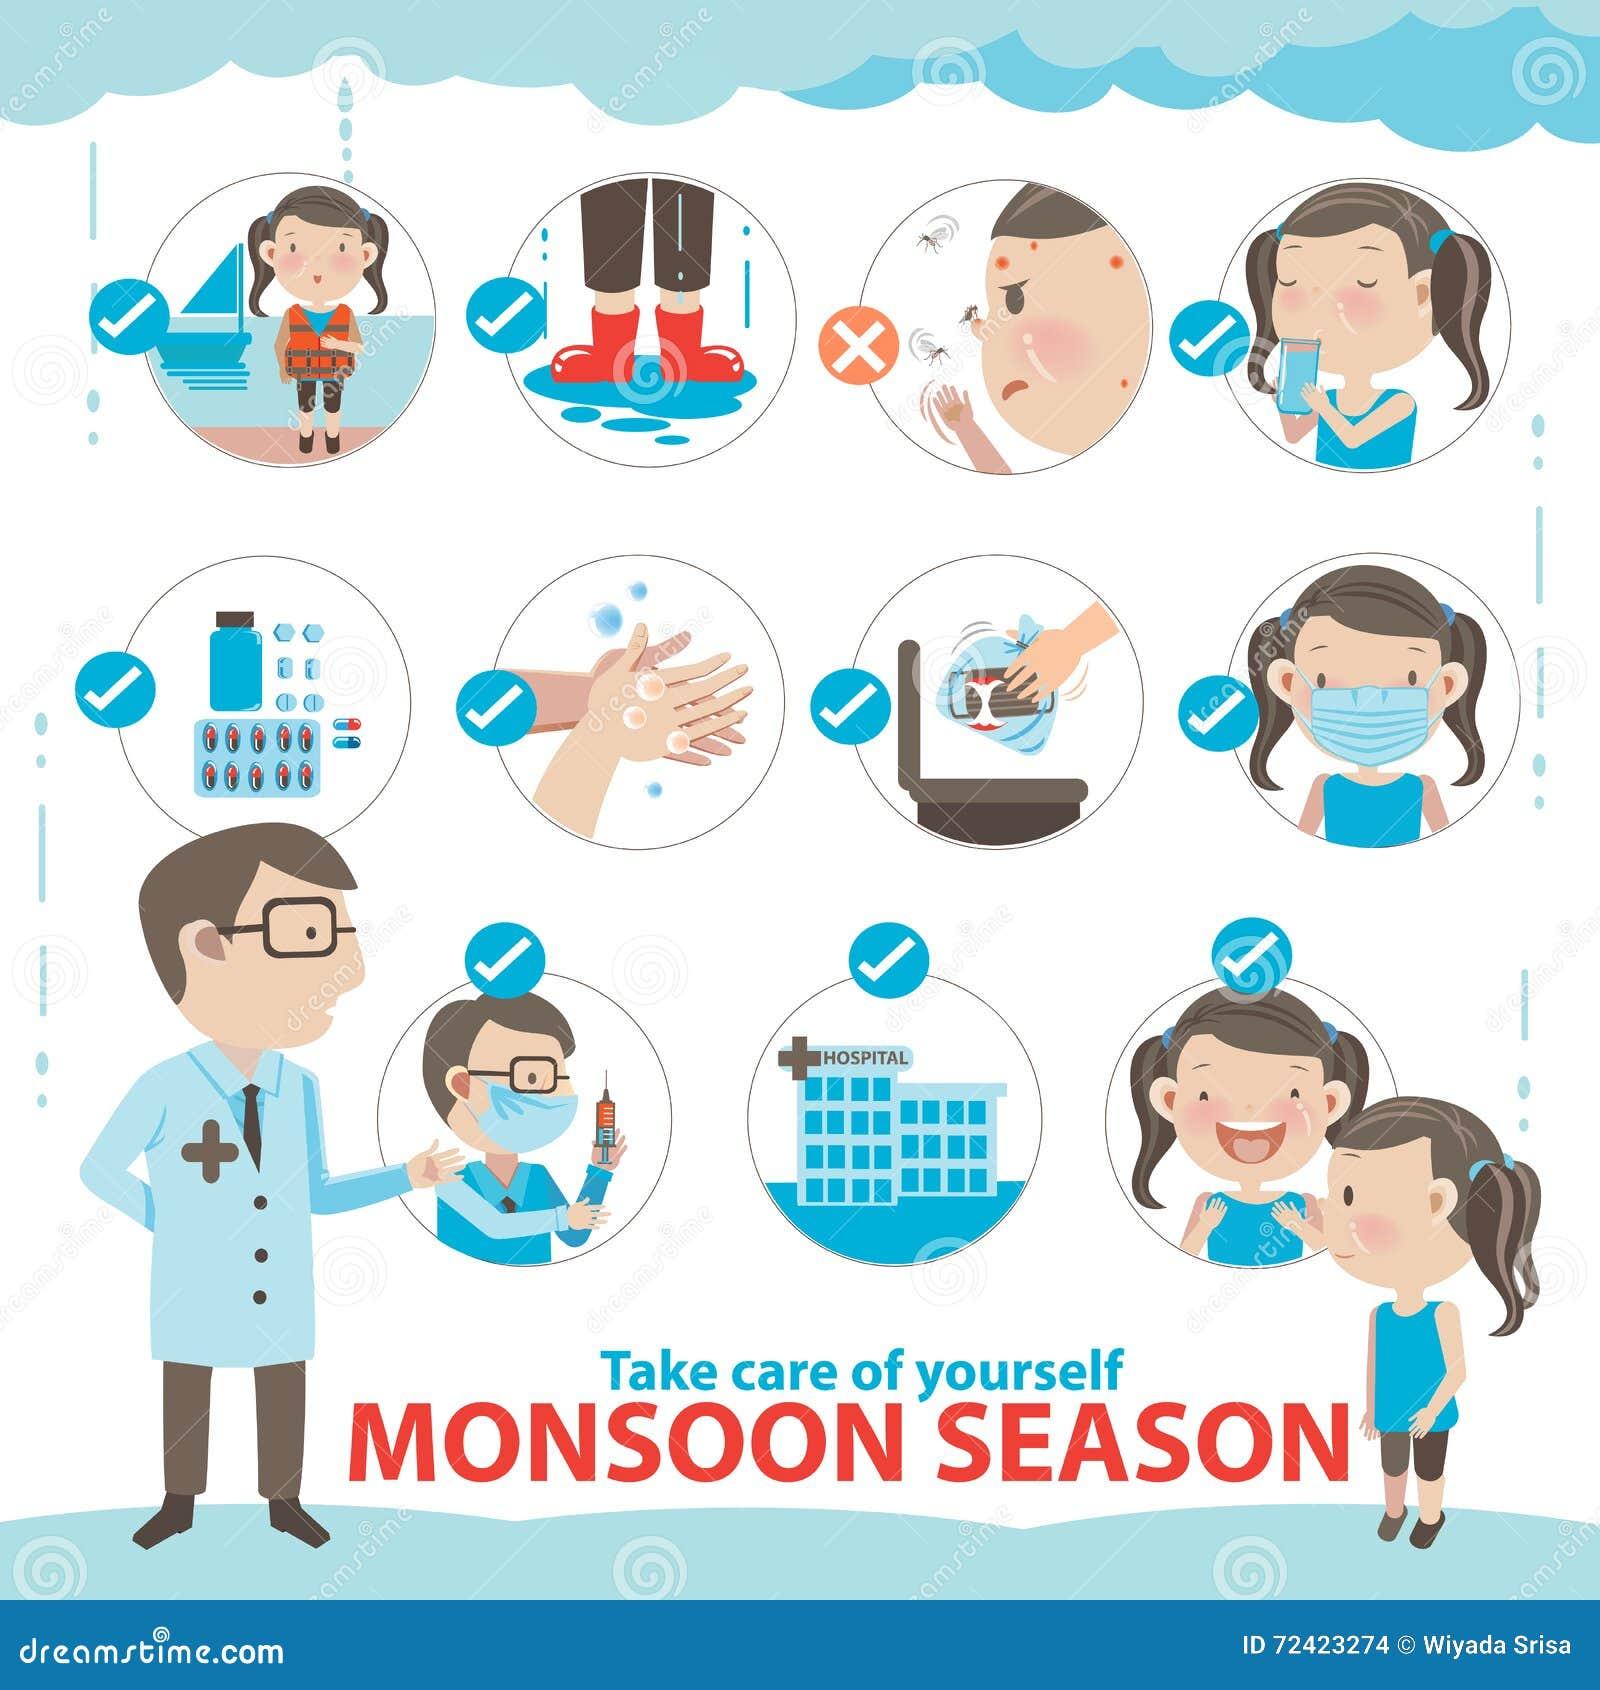 Сезон муссона